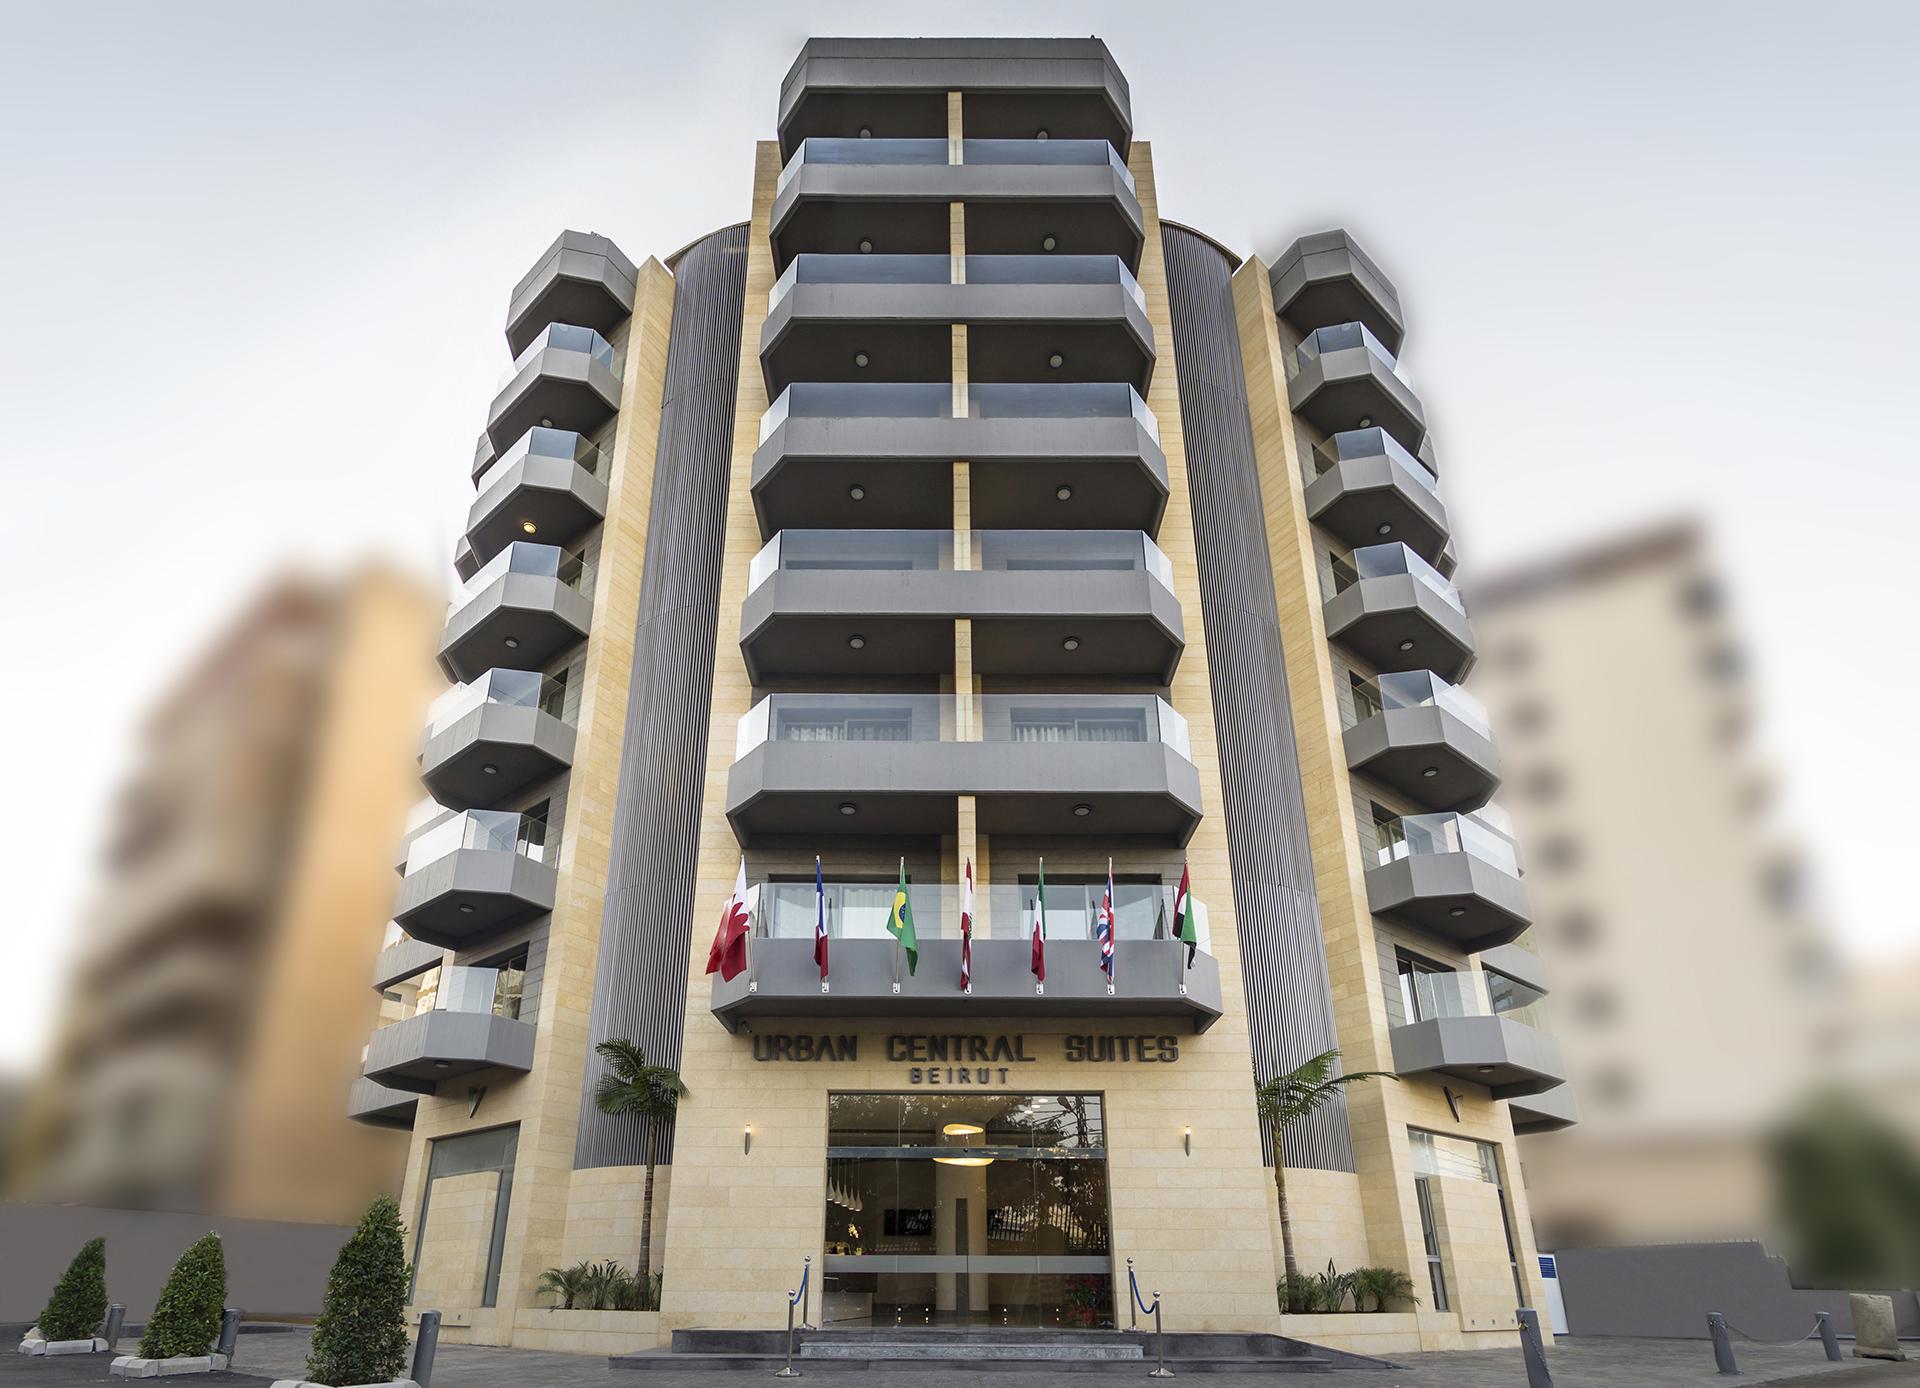 Urban Central Beirut - G - 6